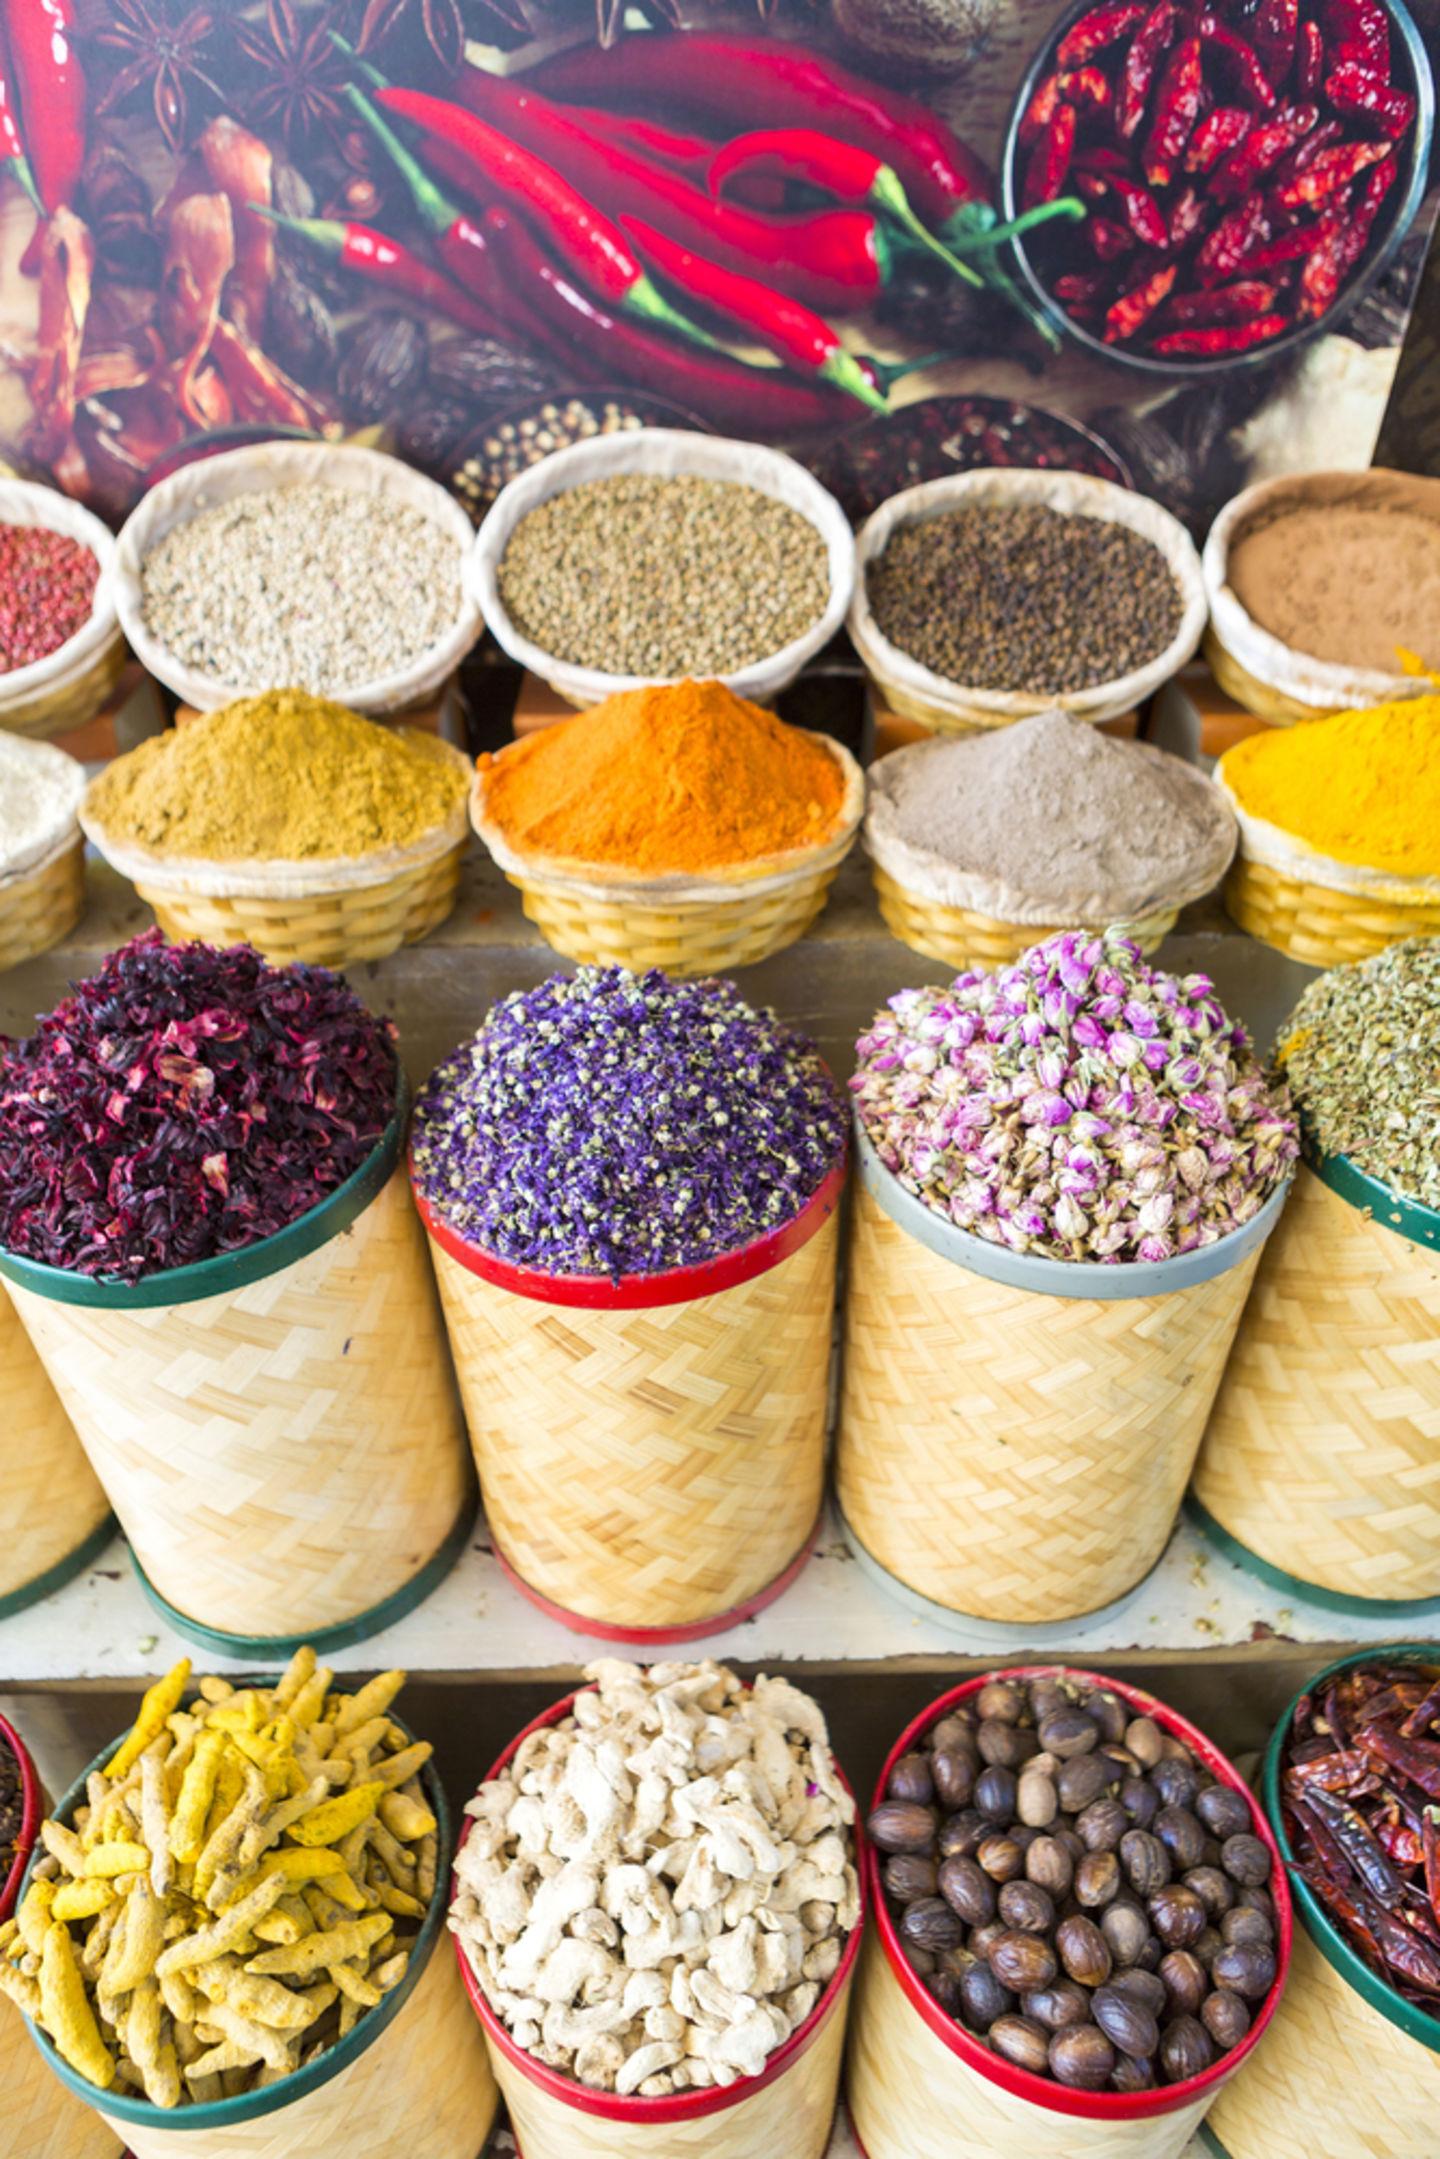 HiDubai-business-delma-foodstuff-trading-b2b-services-food-stuff-trading-al-melaheyah-dubai-2